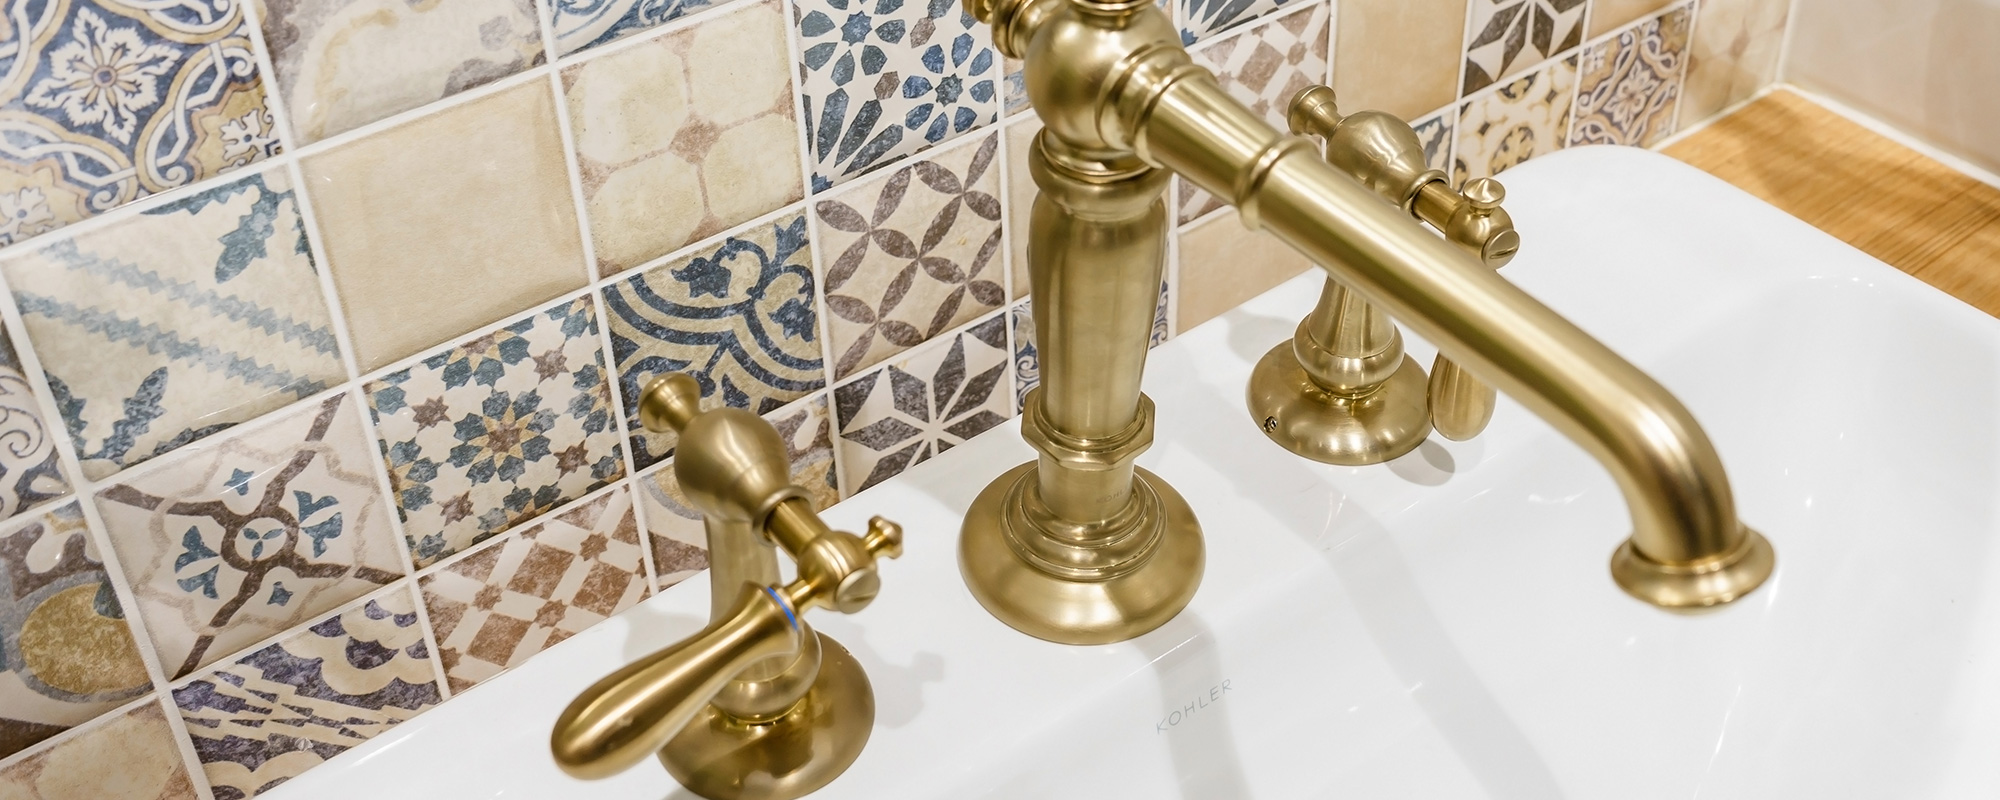 Golden Bathroom Faucet